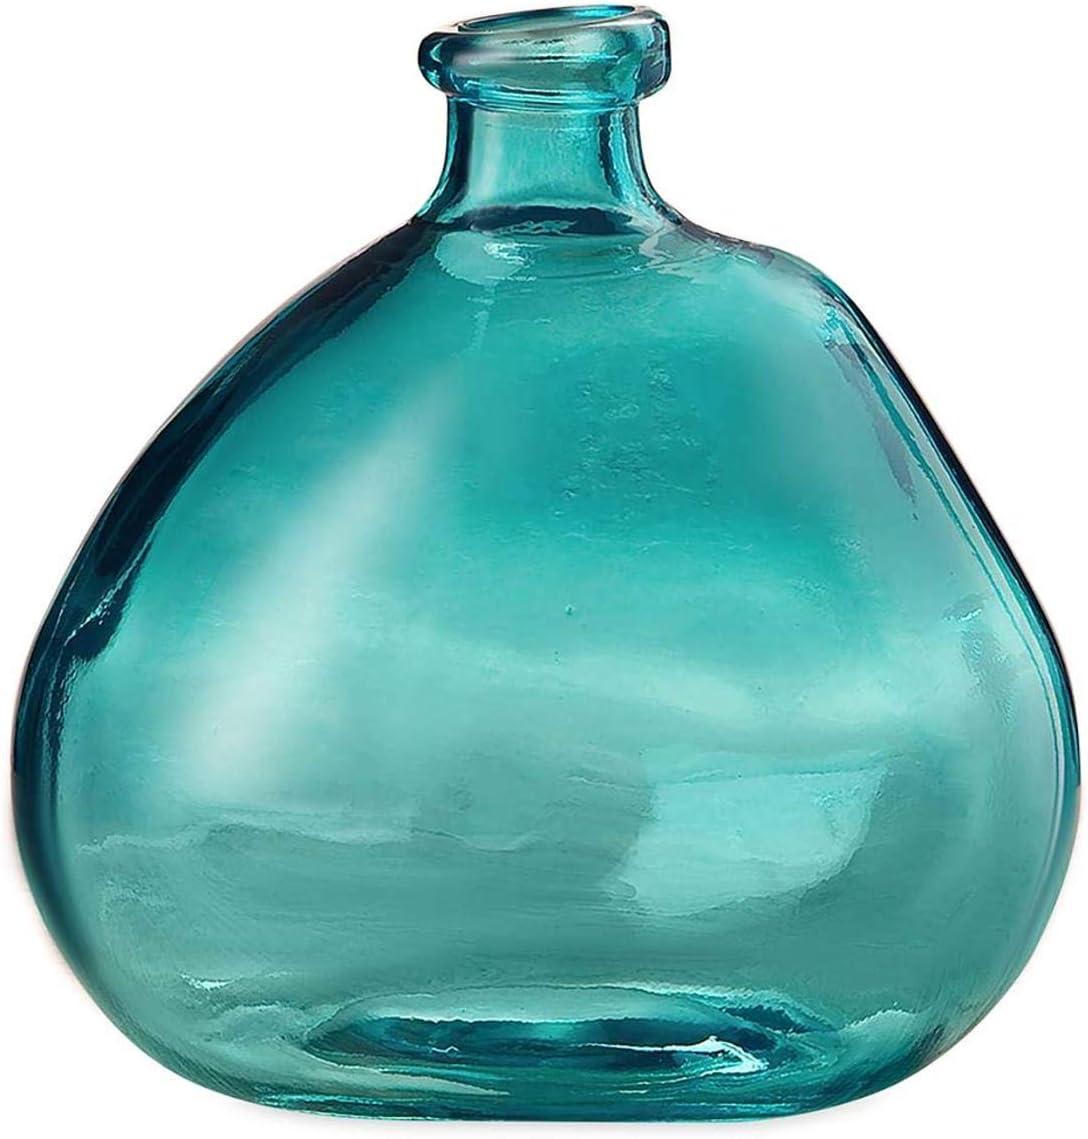 Aqua Askew Recycled Glass Balloon Vase, 9